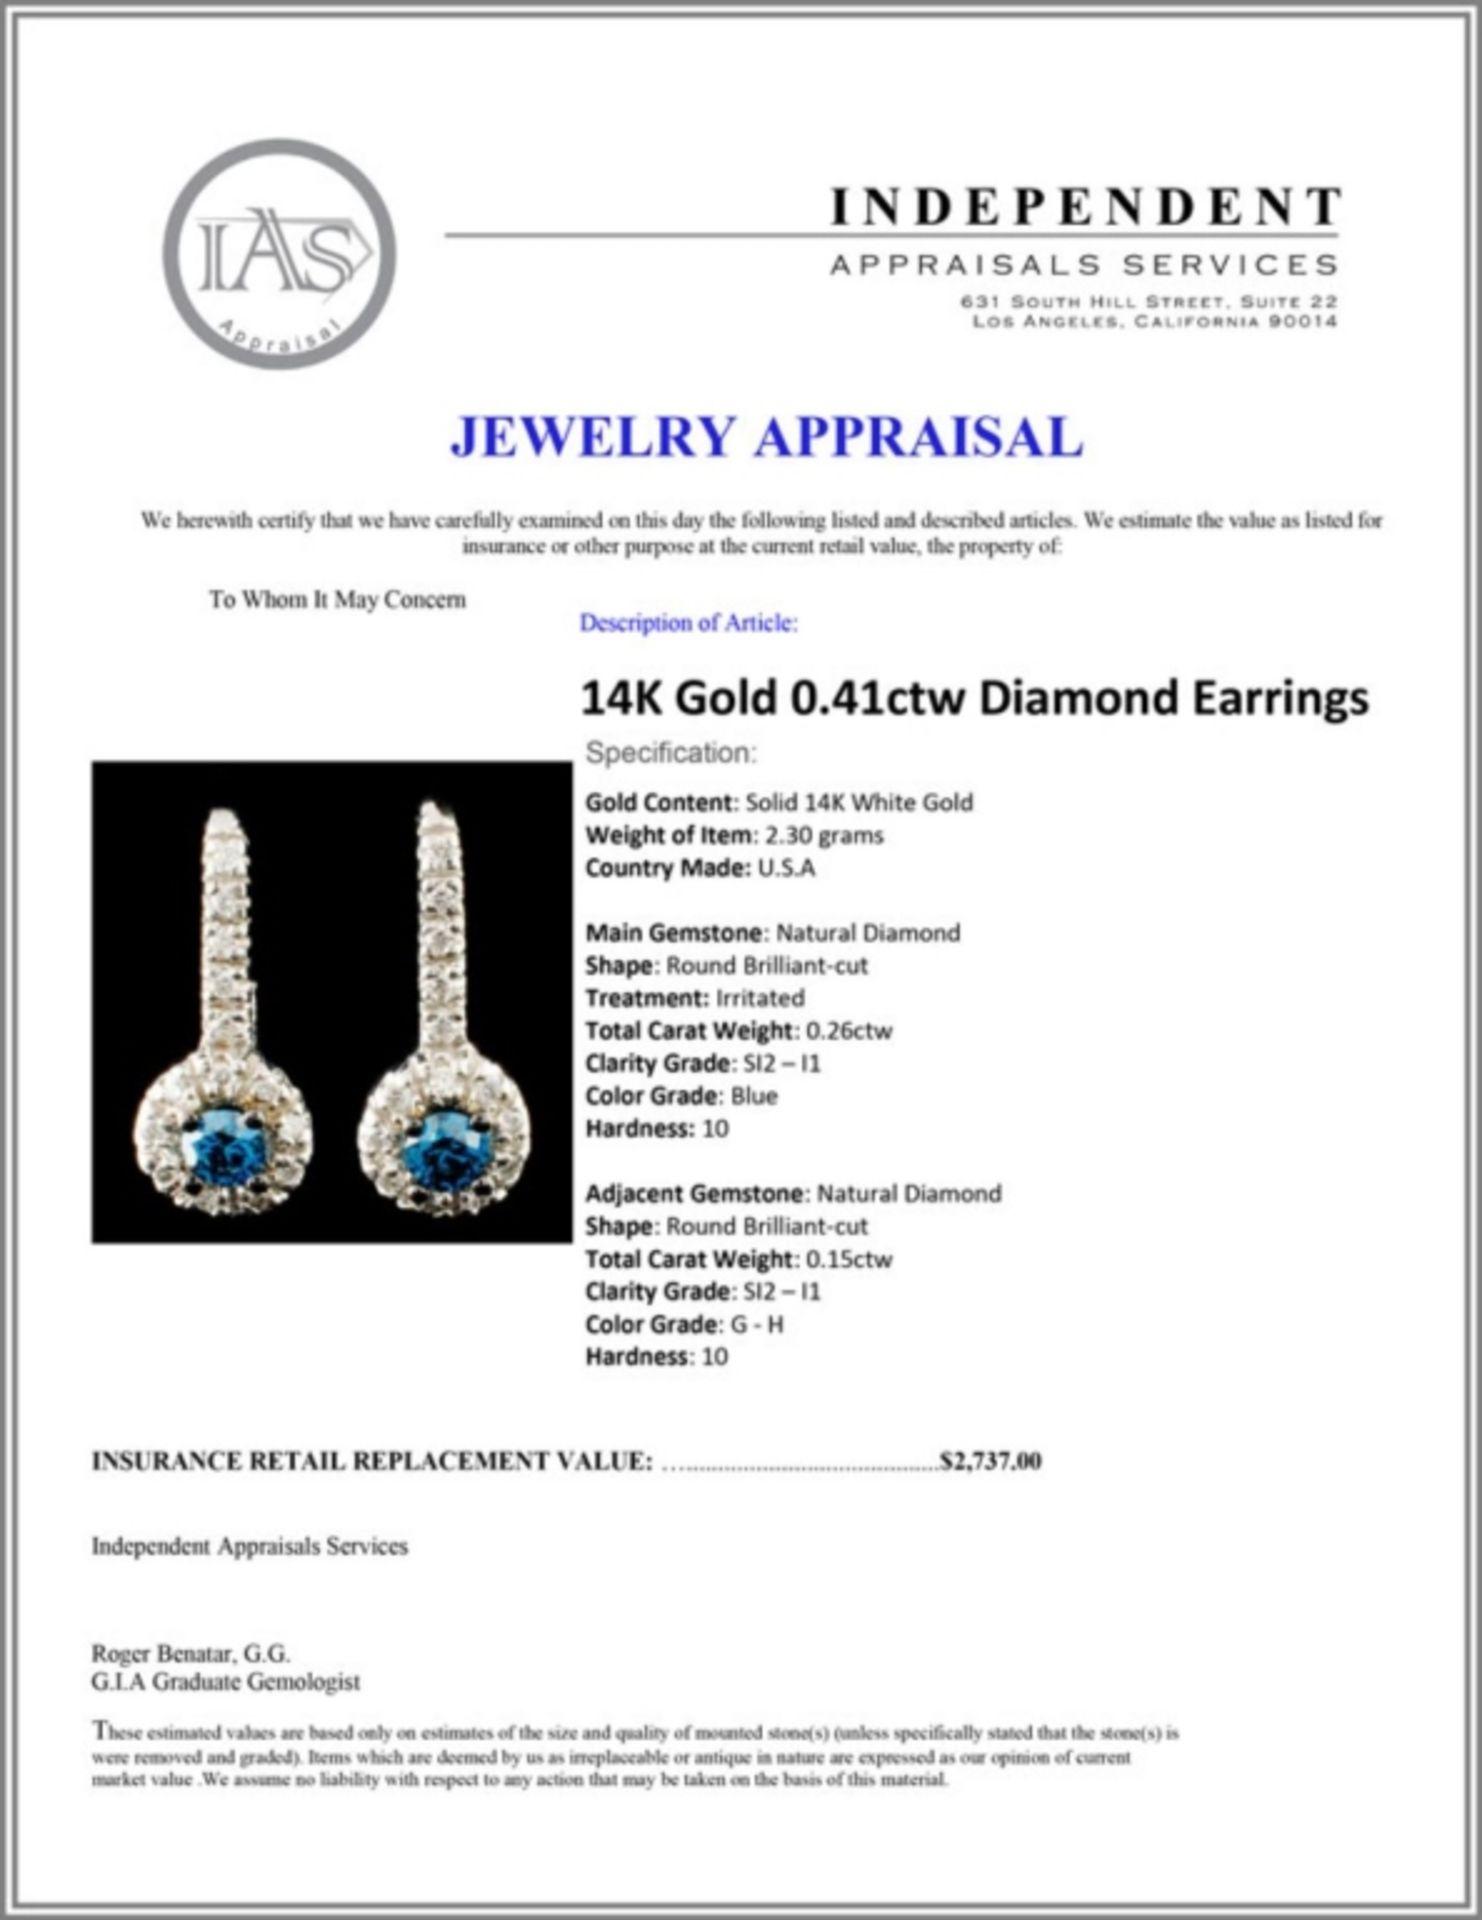 14K Gold 0.41ctw Diamond Earrings - Image 3 of 3